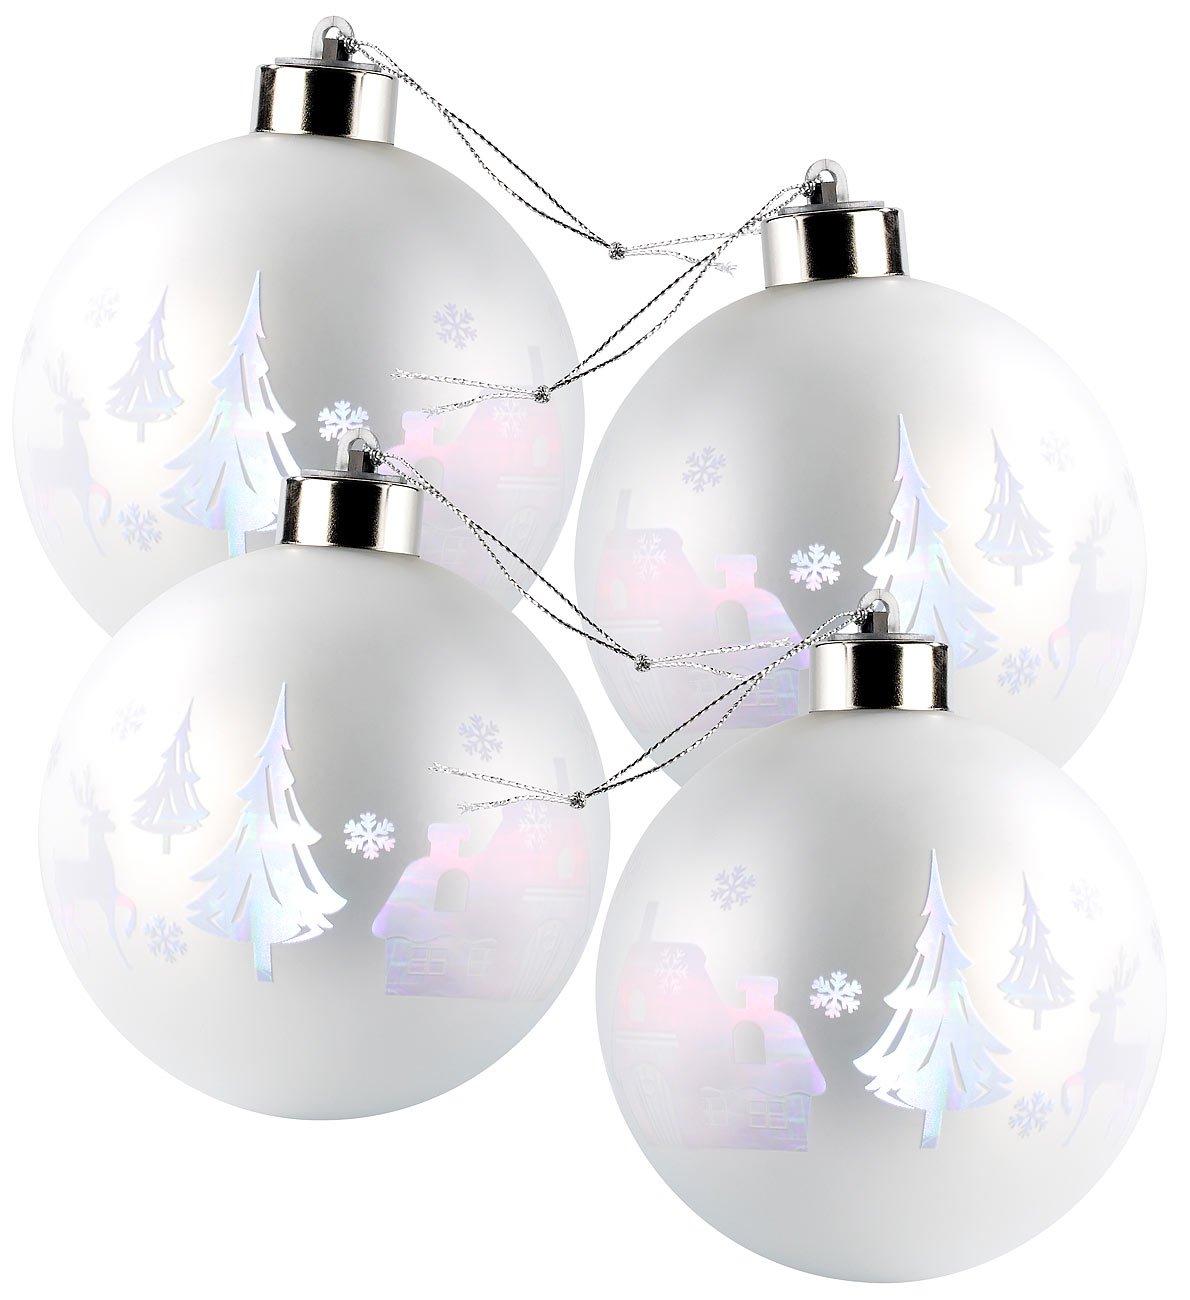 Led Weihnachtskugeln.Lunartec Led Weihnachtskugel Christbaumkugeln Mit Farbwechsel Leds